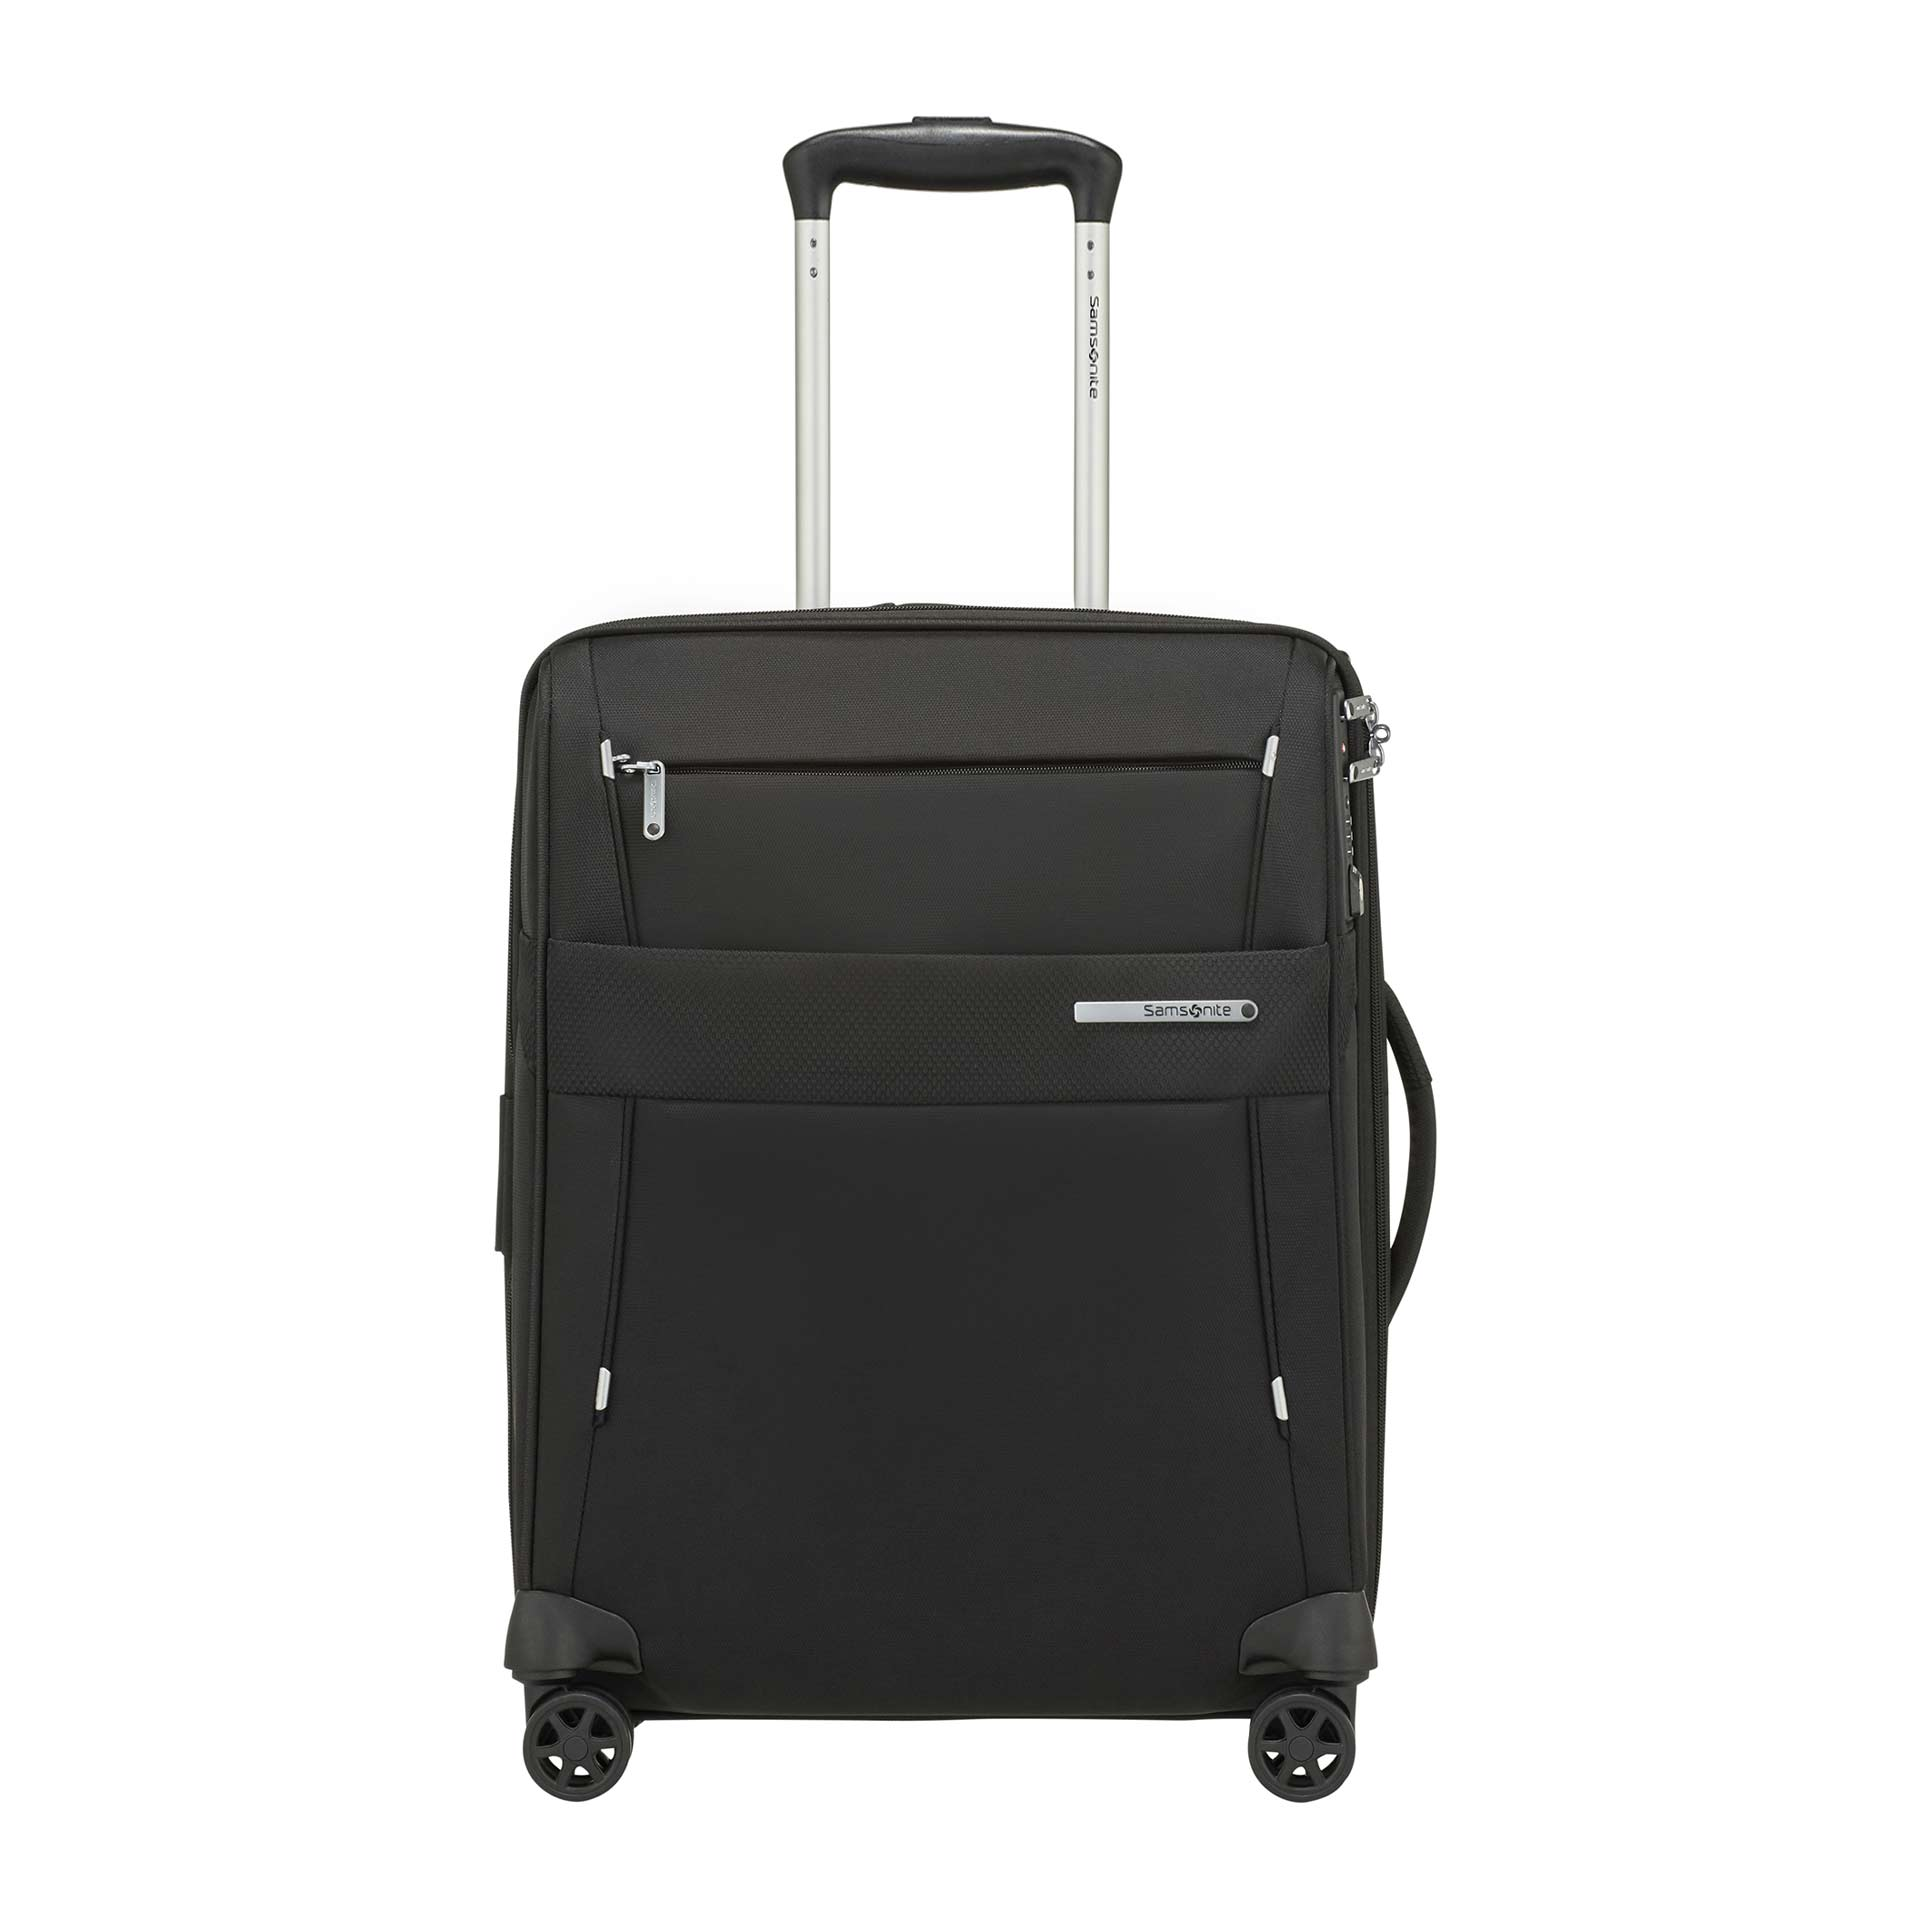 Duopack Trolley mit 4 Rollen 55 cm black